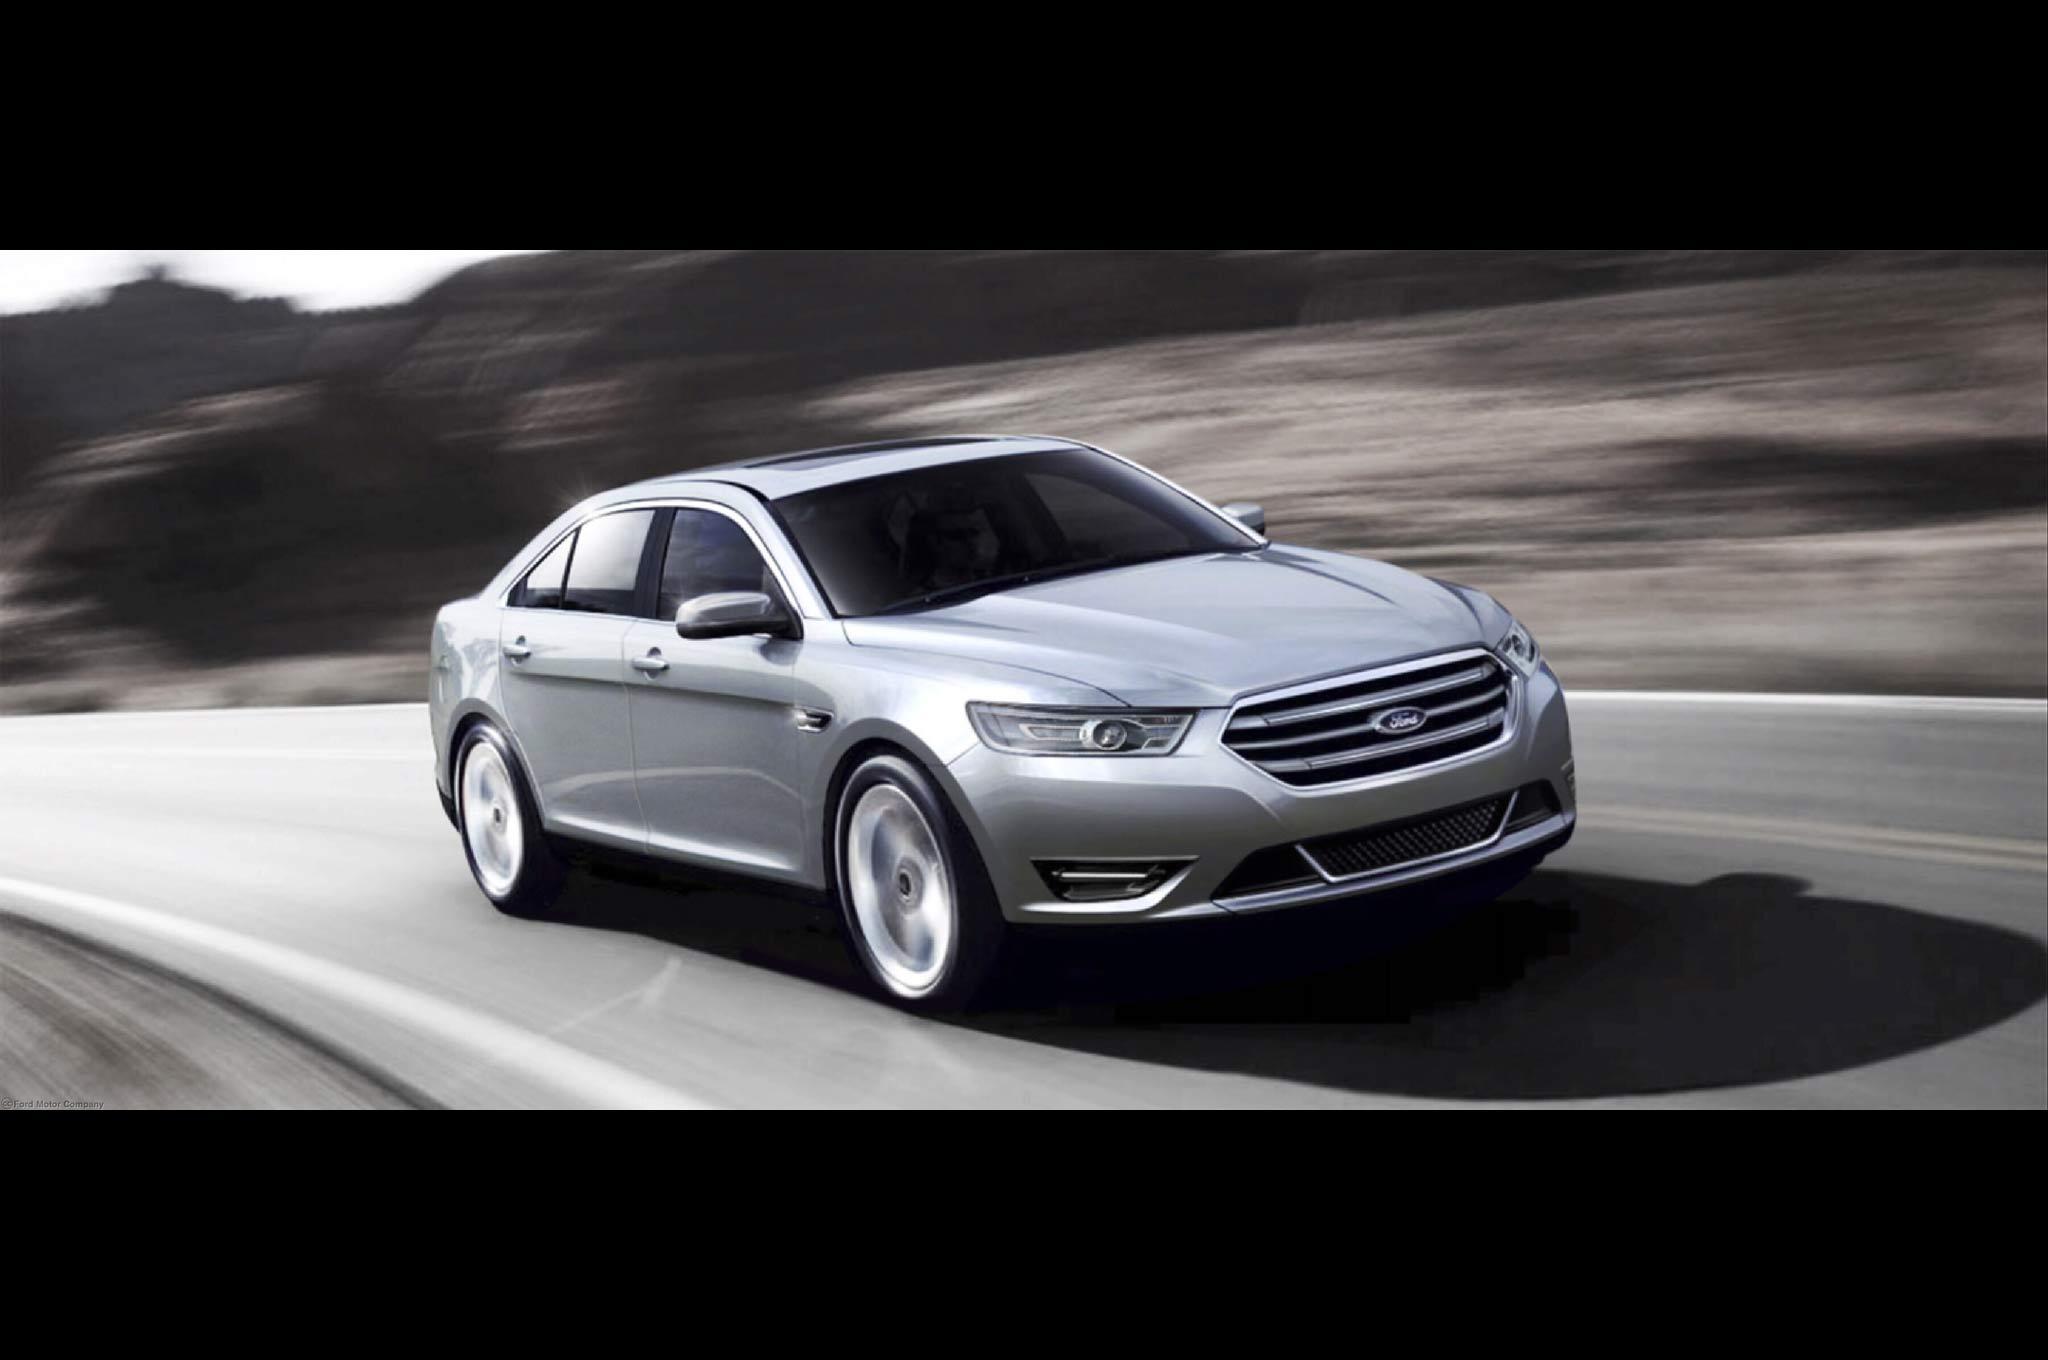 Ford Taurus Sho 0-60 >> First Drive: 2013 Ford Taurus SHO Performance Package ...